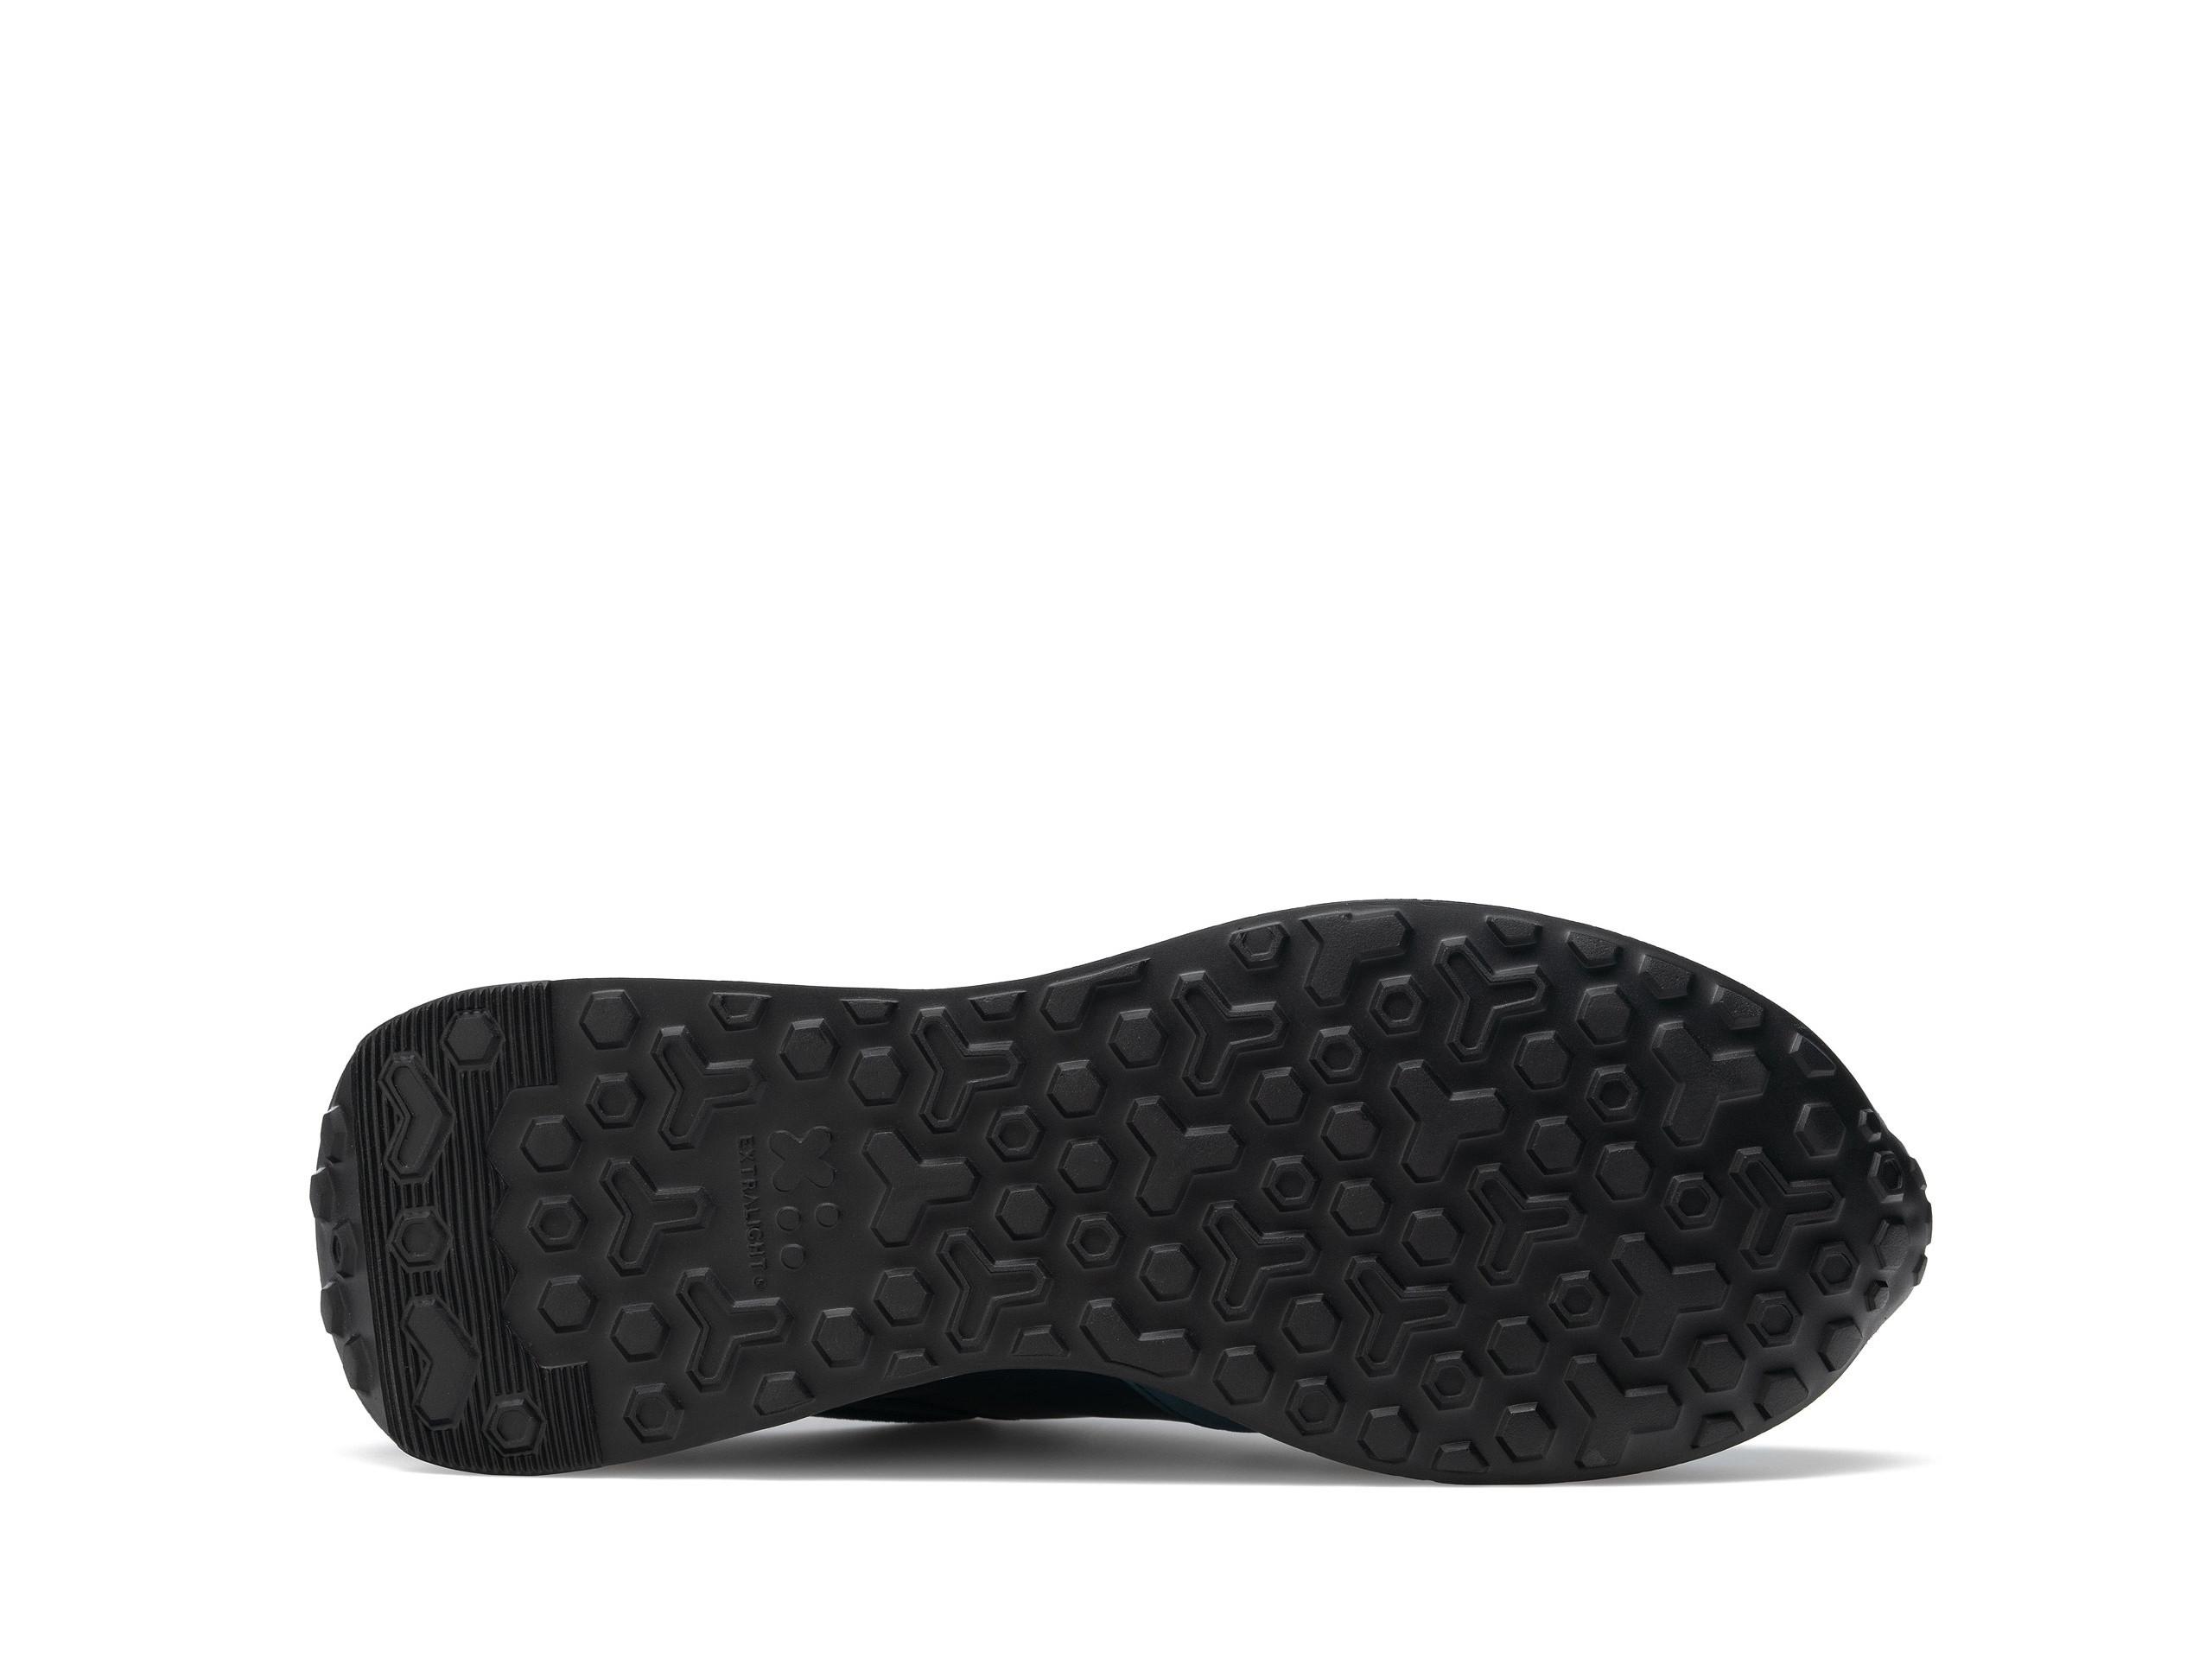 The sole of the Ecija